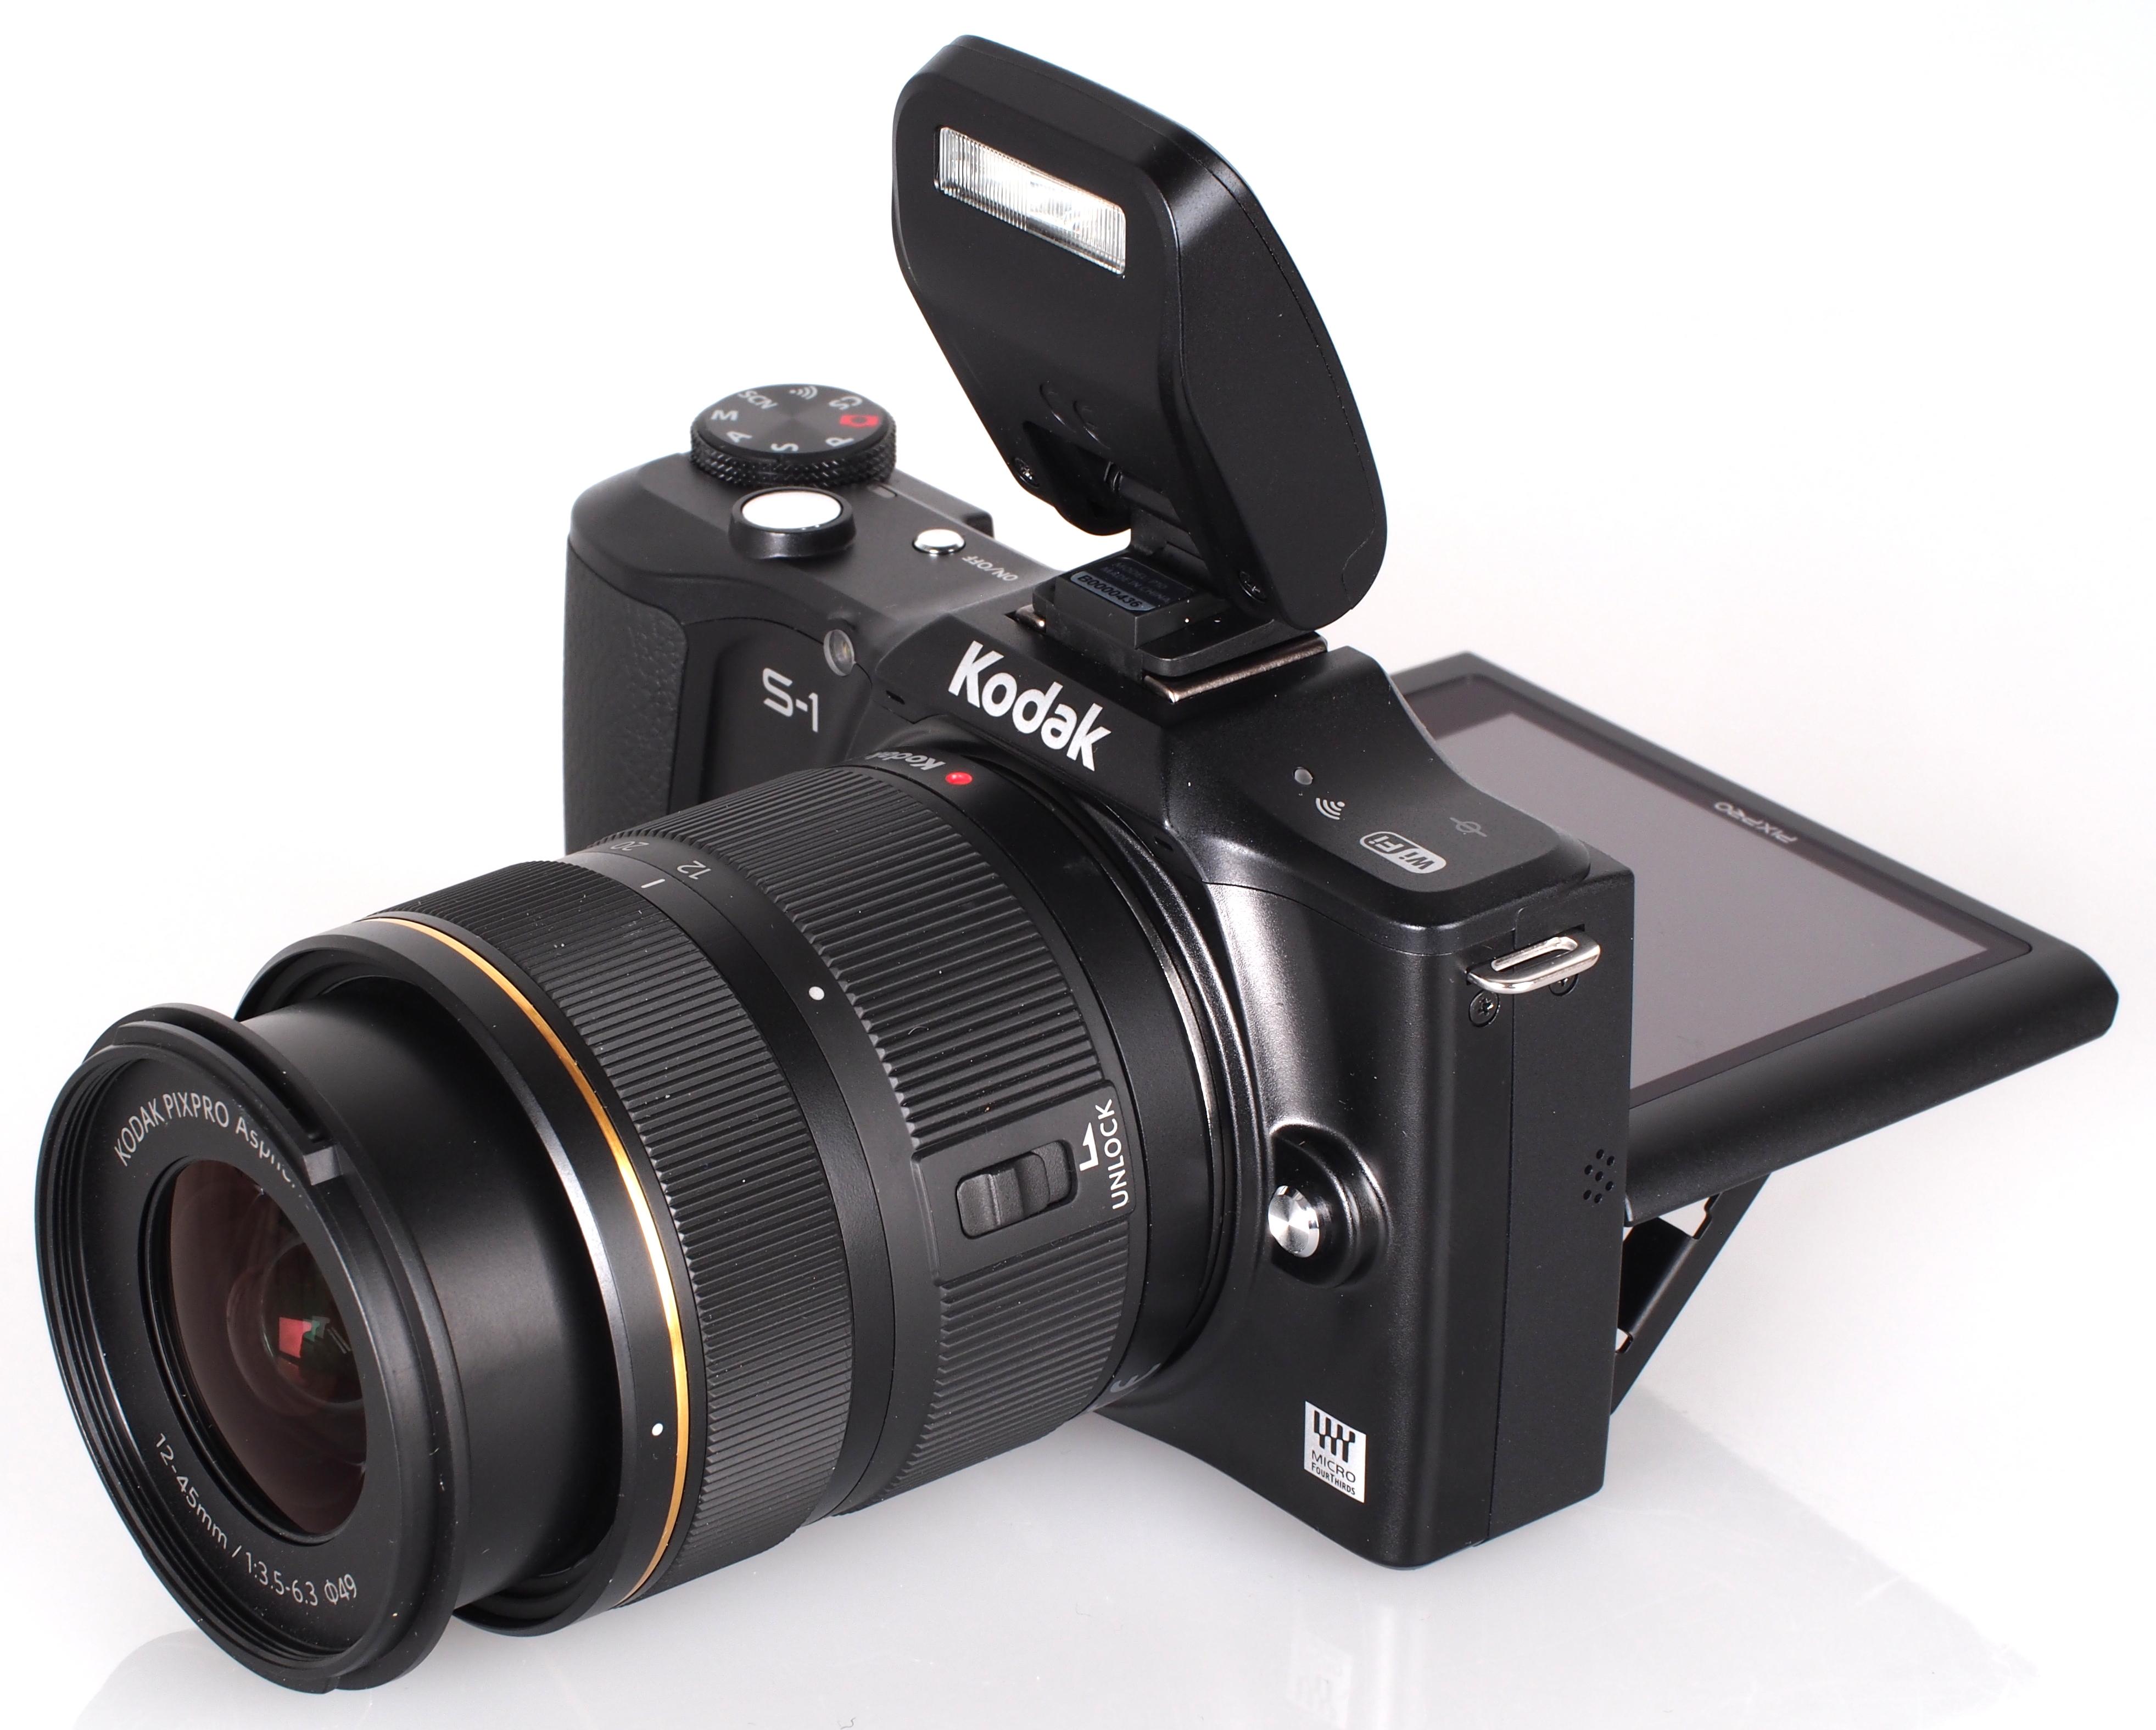 Kodak PIXPRO S-1 Review | ePHOTOzine